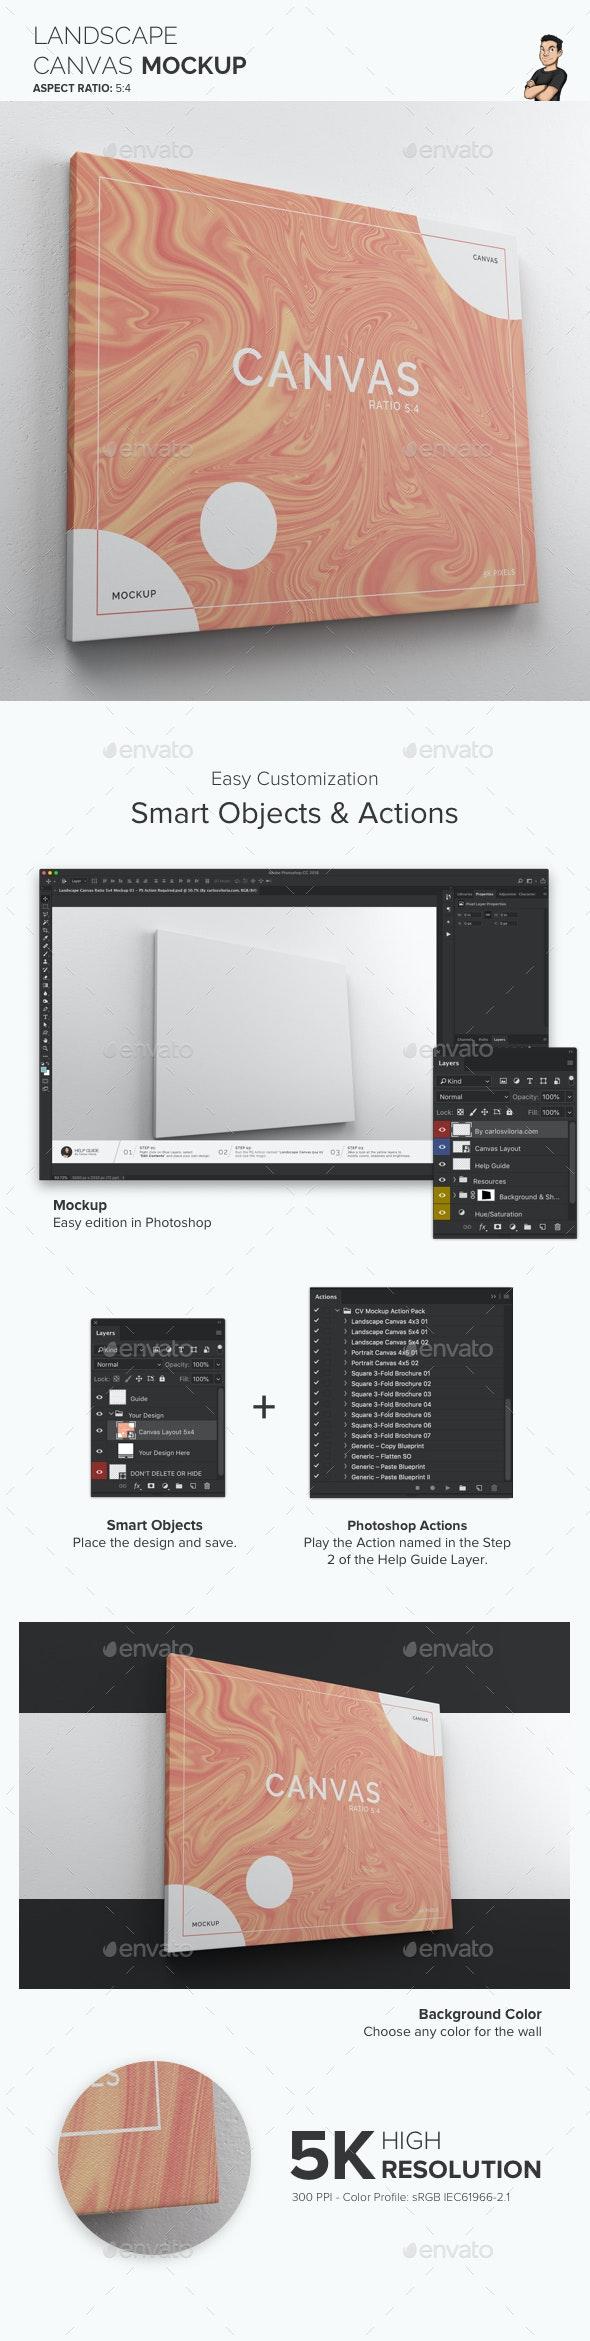 Landscape Canvas Ratio 5x4 Mockup 01 - Print Product Mock-Ups